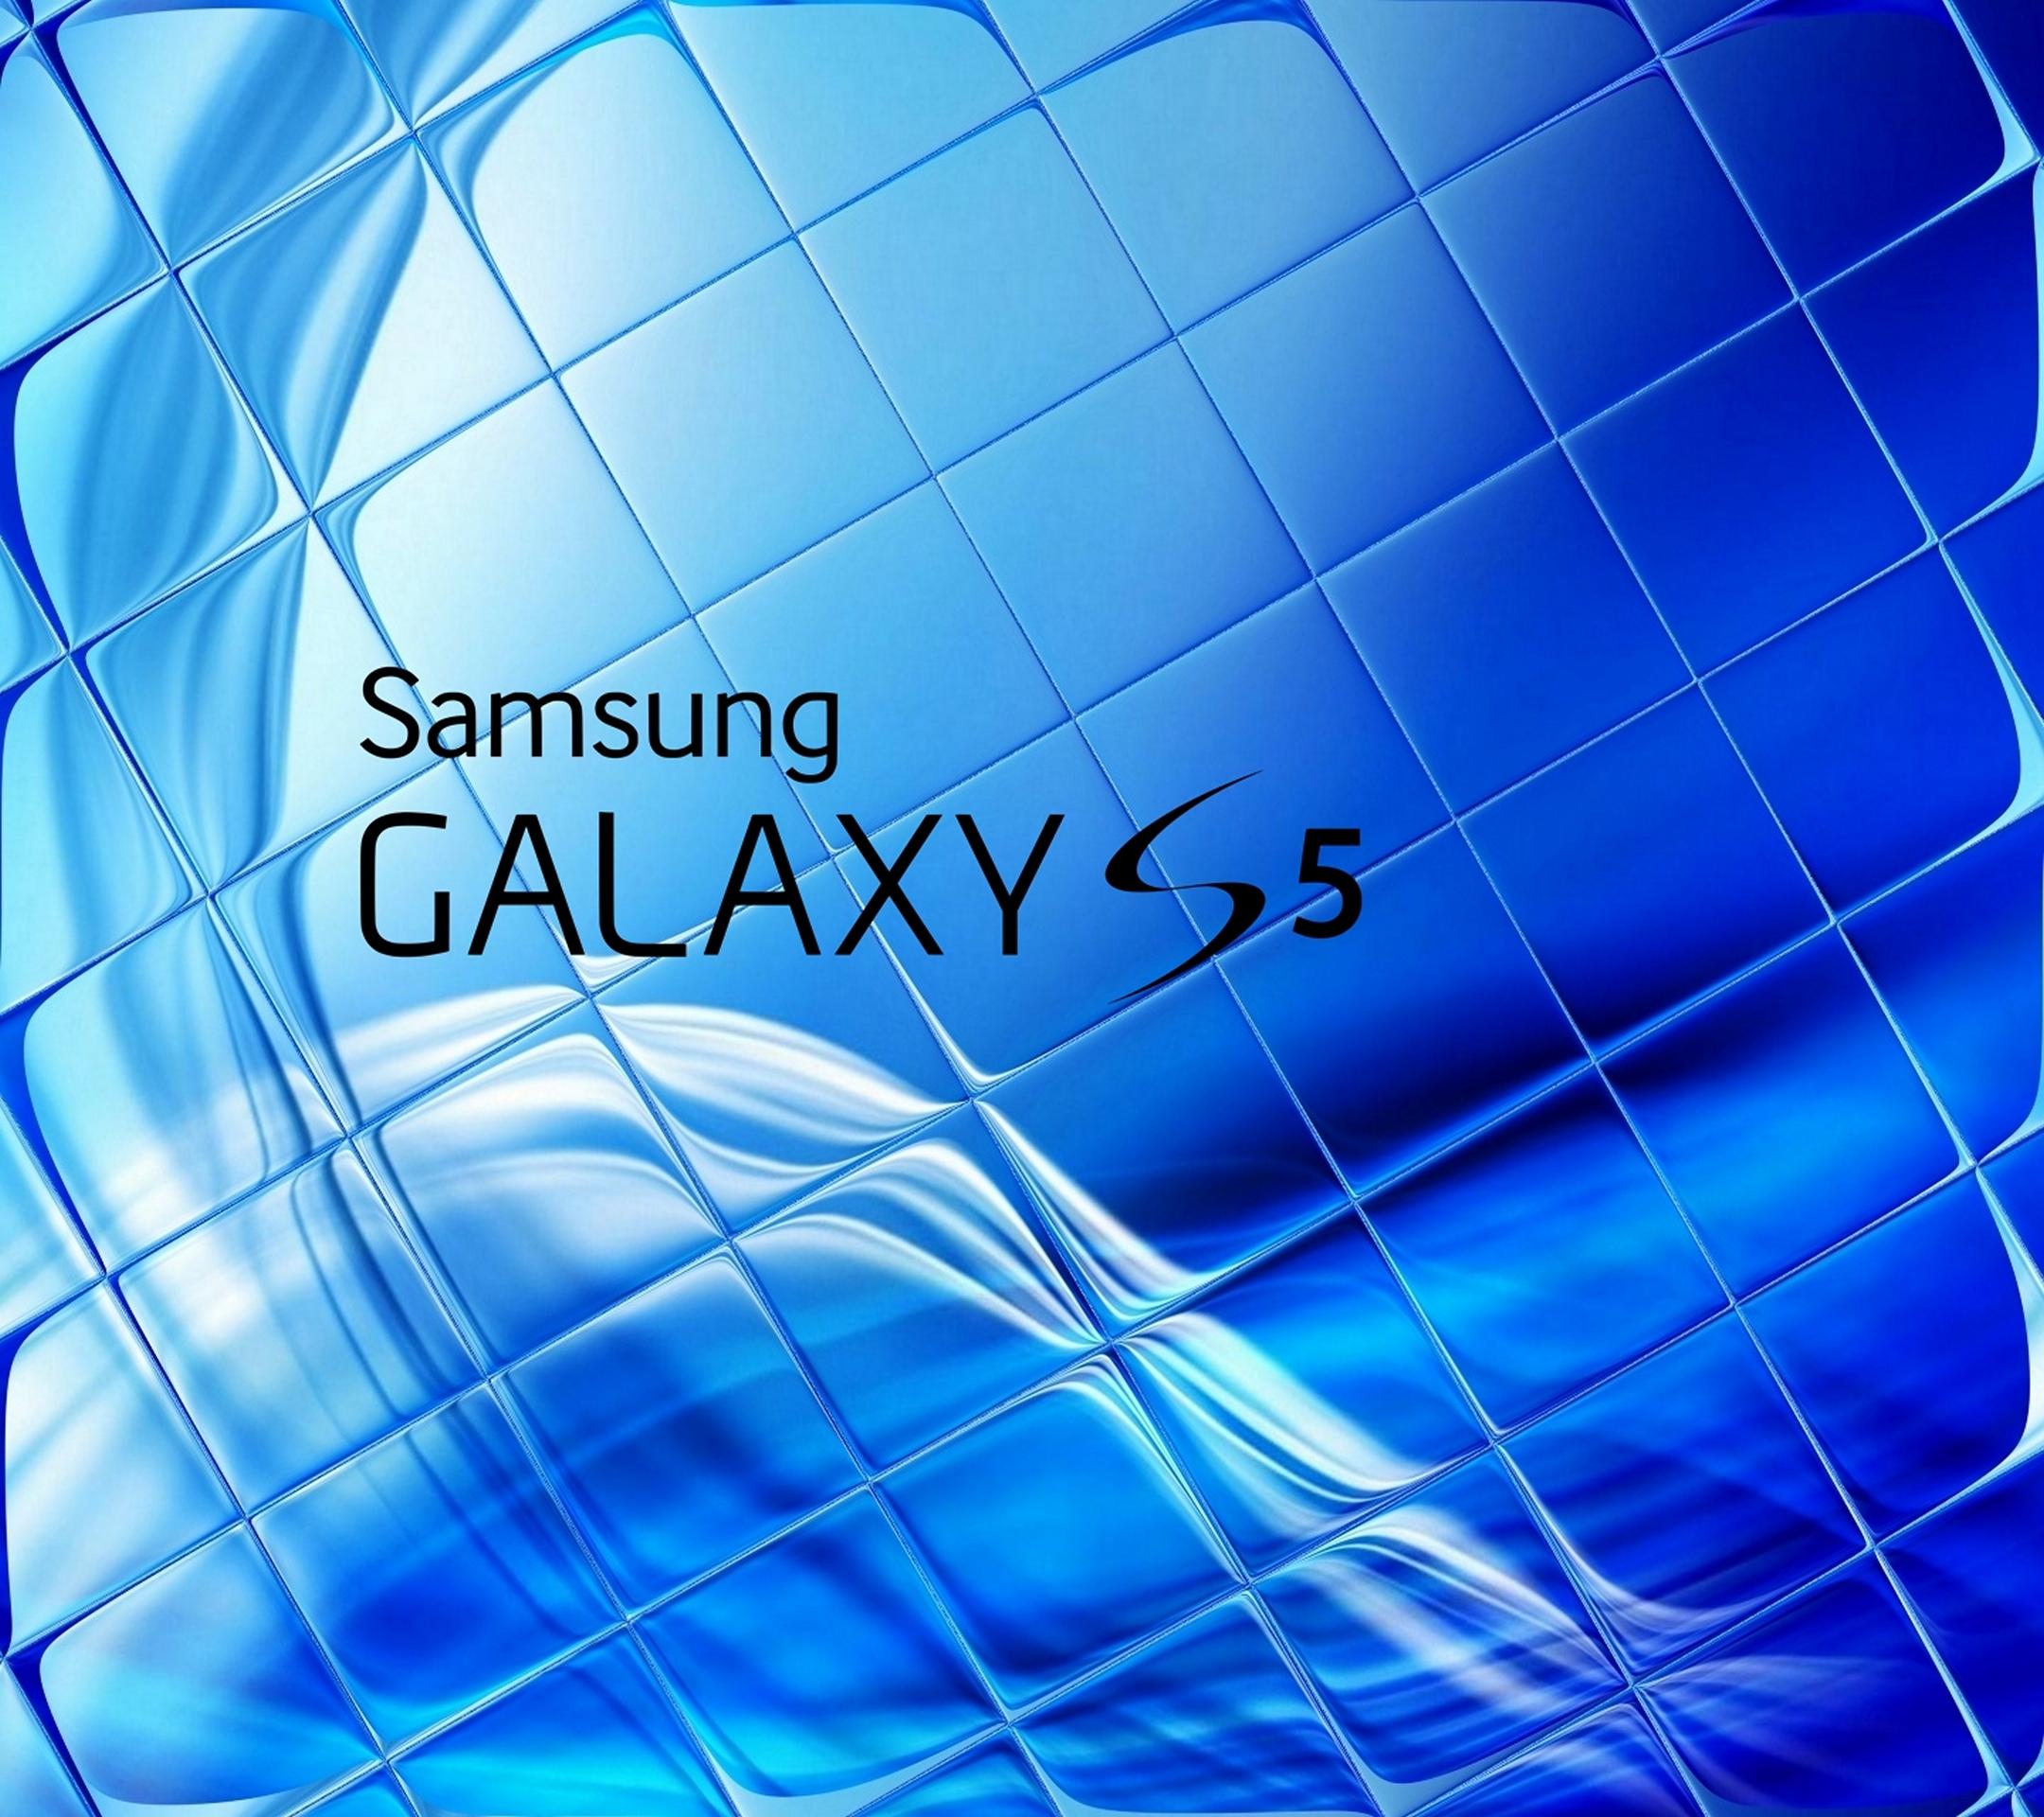 Fond D Ecran Galaxy S5 Galaxy S5 02 2160x1920 Gratuit